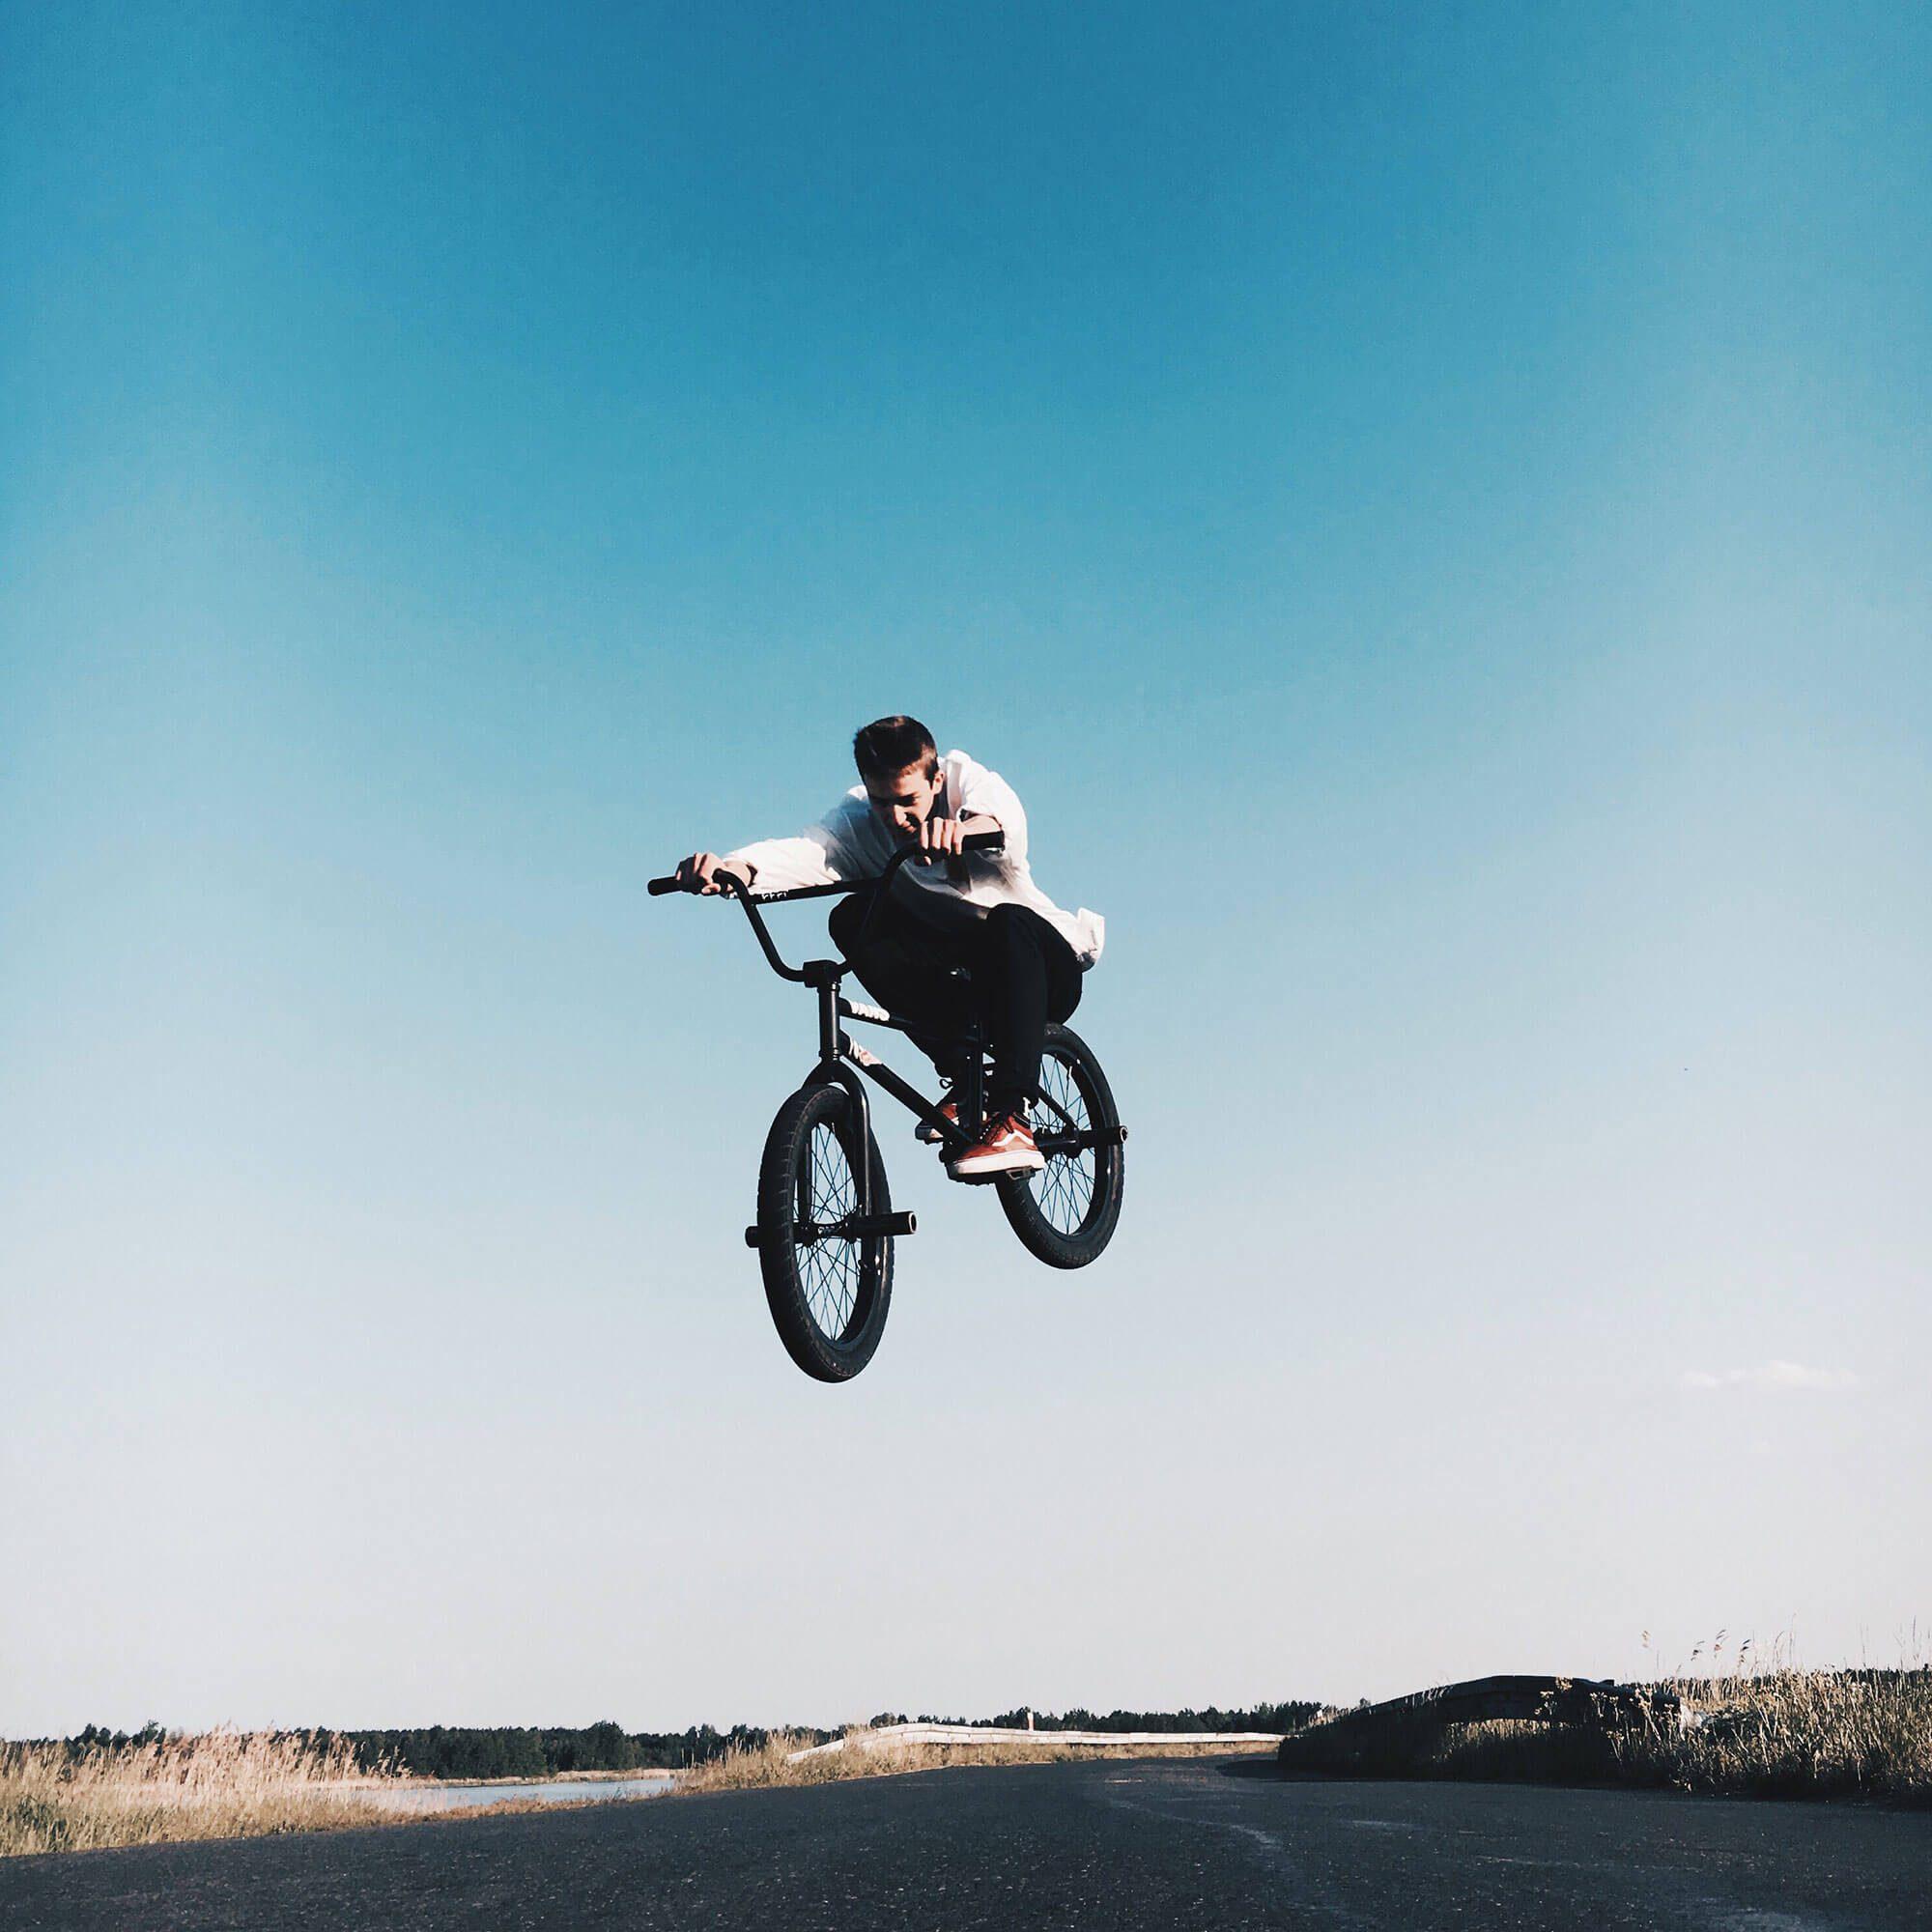 Boy on bmx in air